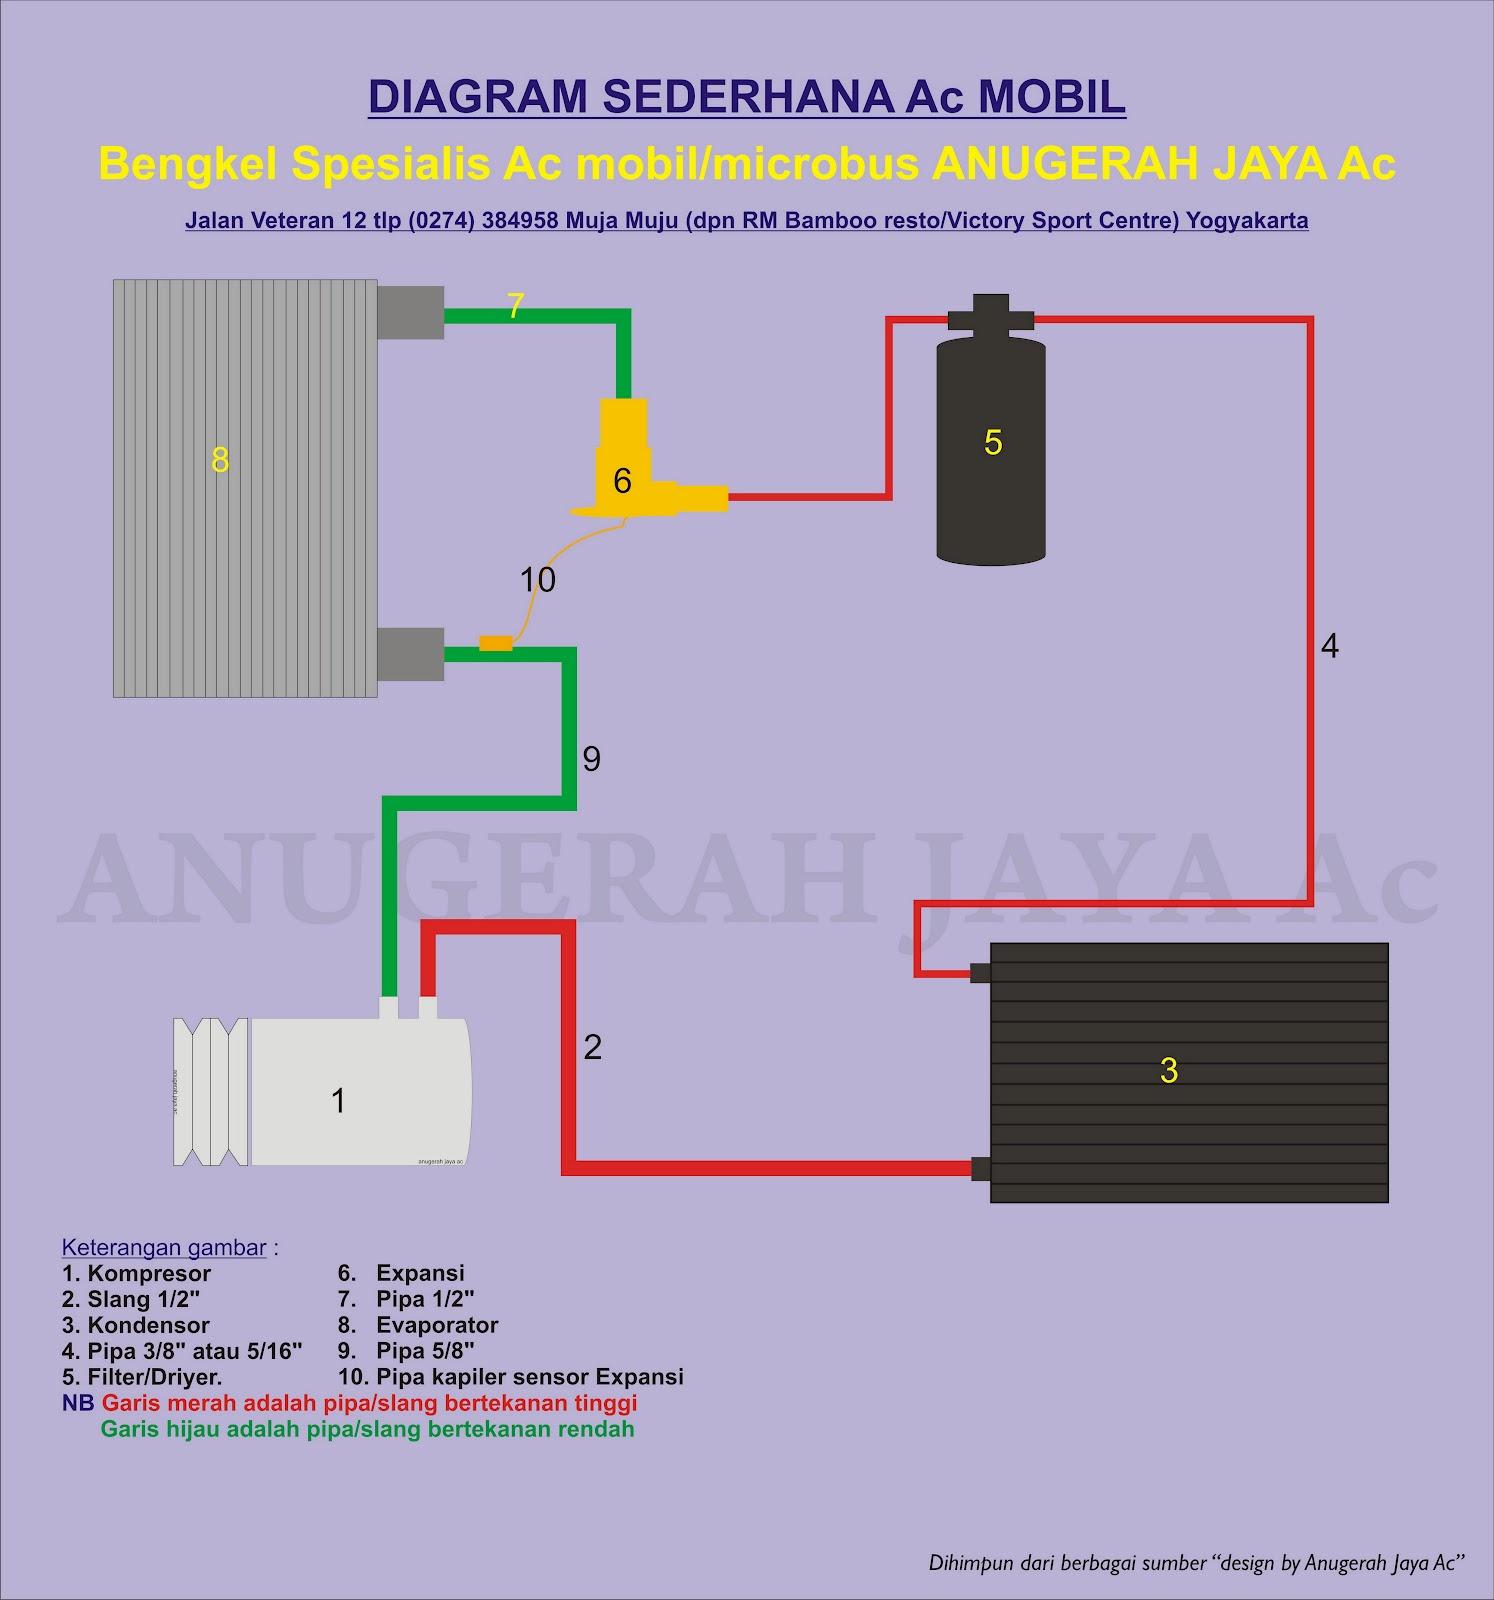 Wiring diagram ac mobil diagram kelistrikan sederhana ac mobil bengkel ac mobil anugerah asfbconference2016 Image collections